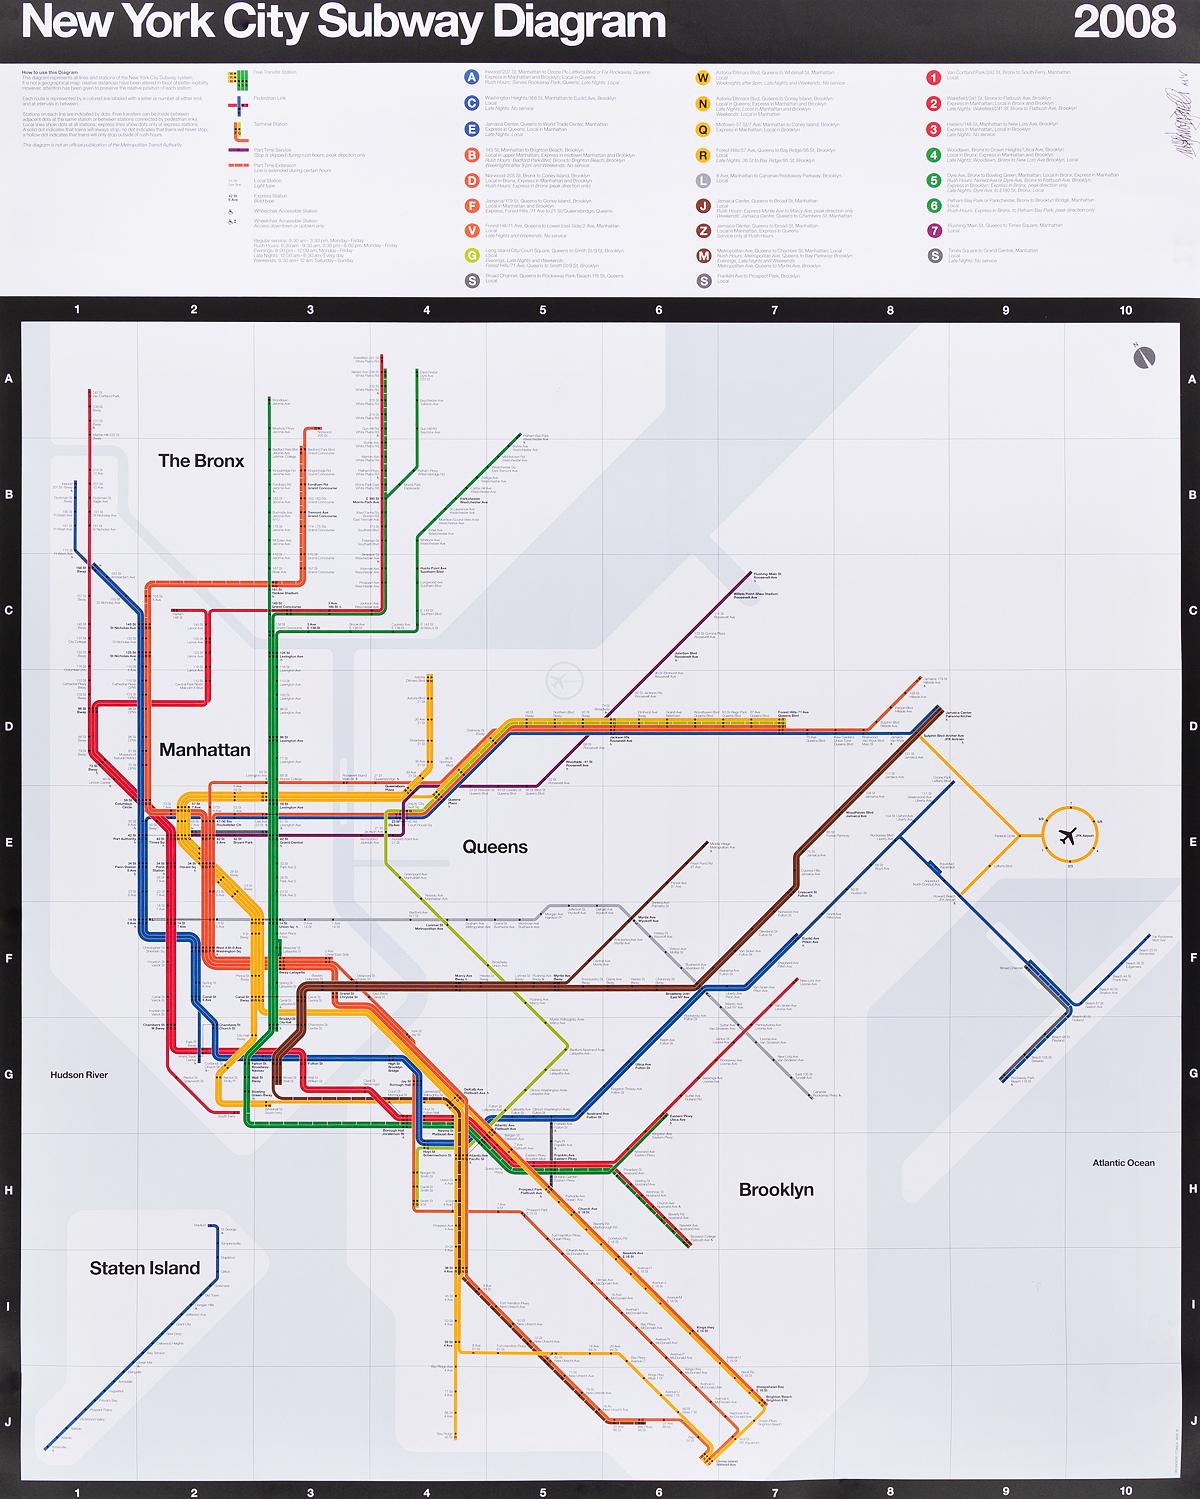 MASSIMO VIGNELLI (1931-2014). NEW YORK CITY SUBWAY DIAGRAM. 2008. 45x36 inches, 114x91 cm.